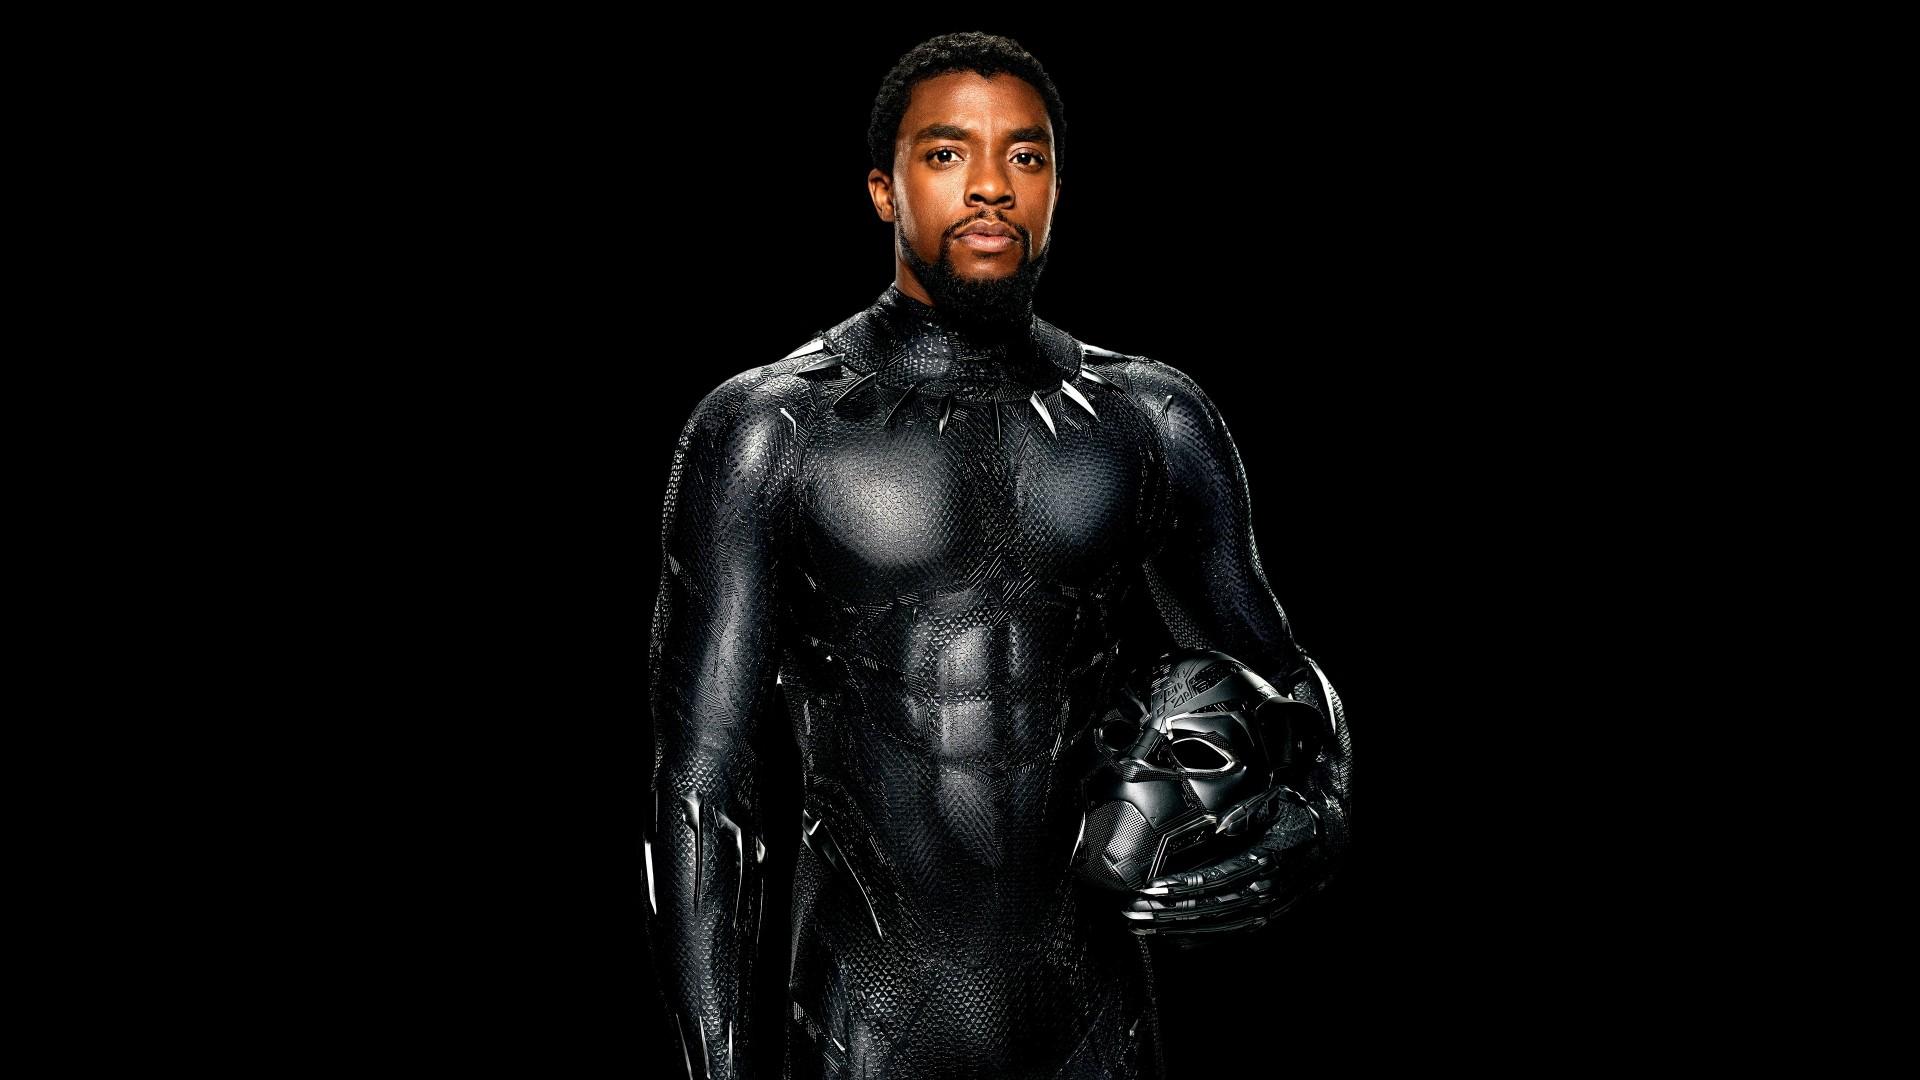 Cute Window 10 Wallpaper Chadwick Boseman As Black Panther 4k Wallpapers Hd